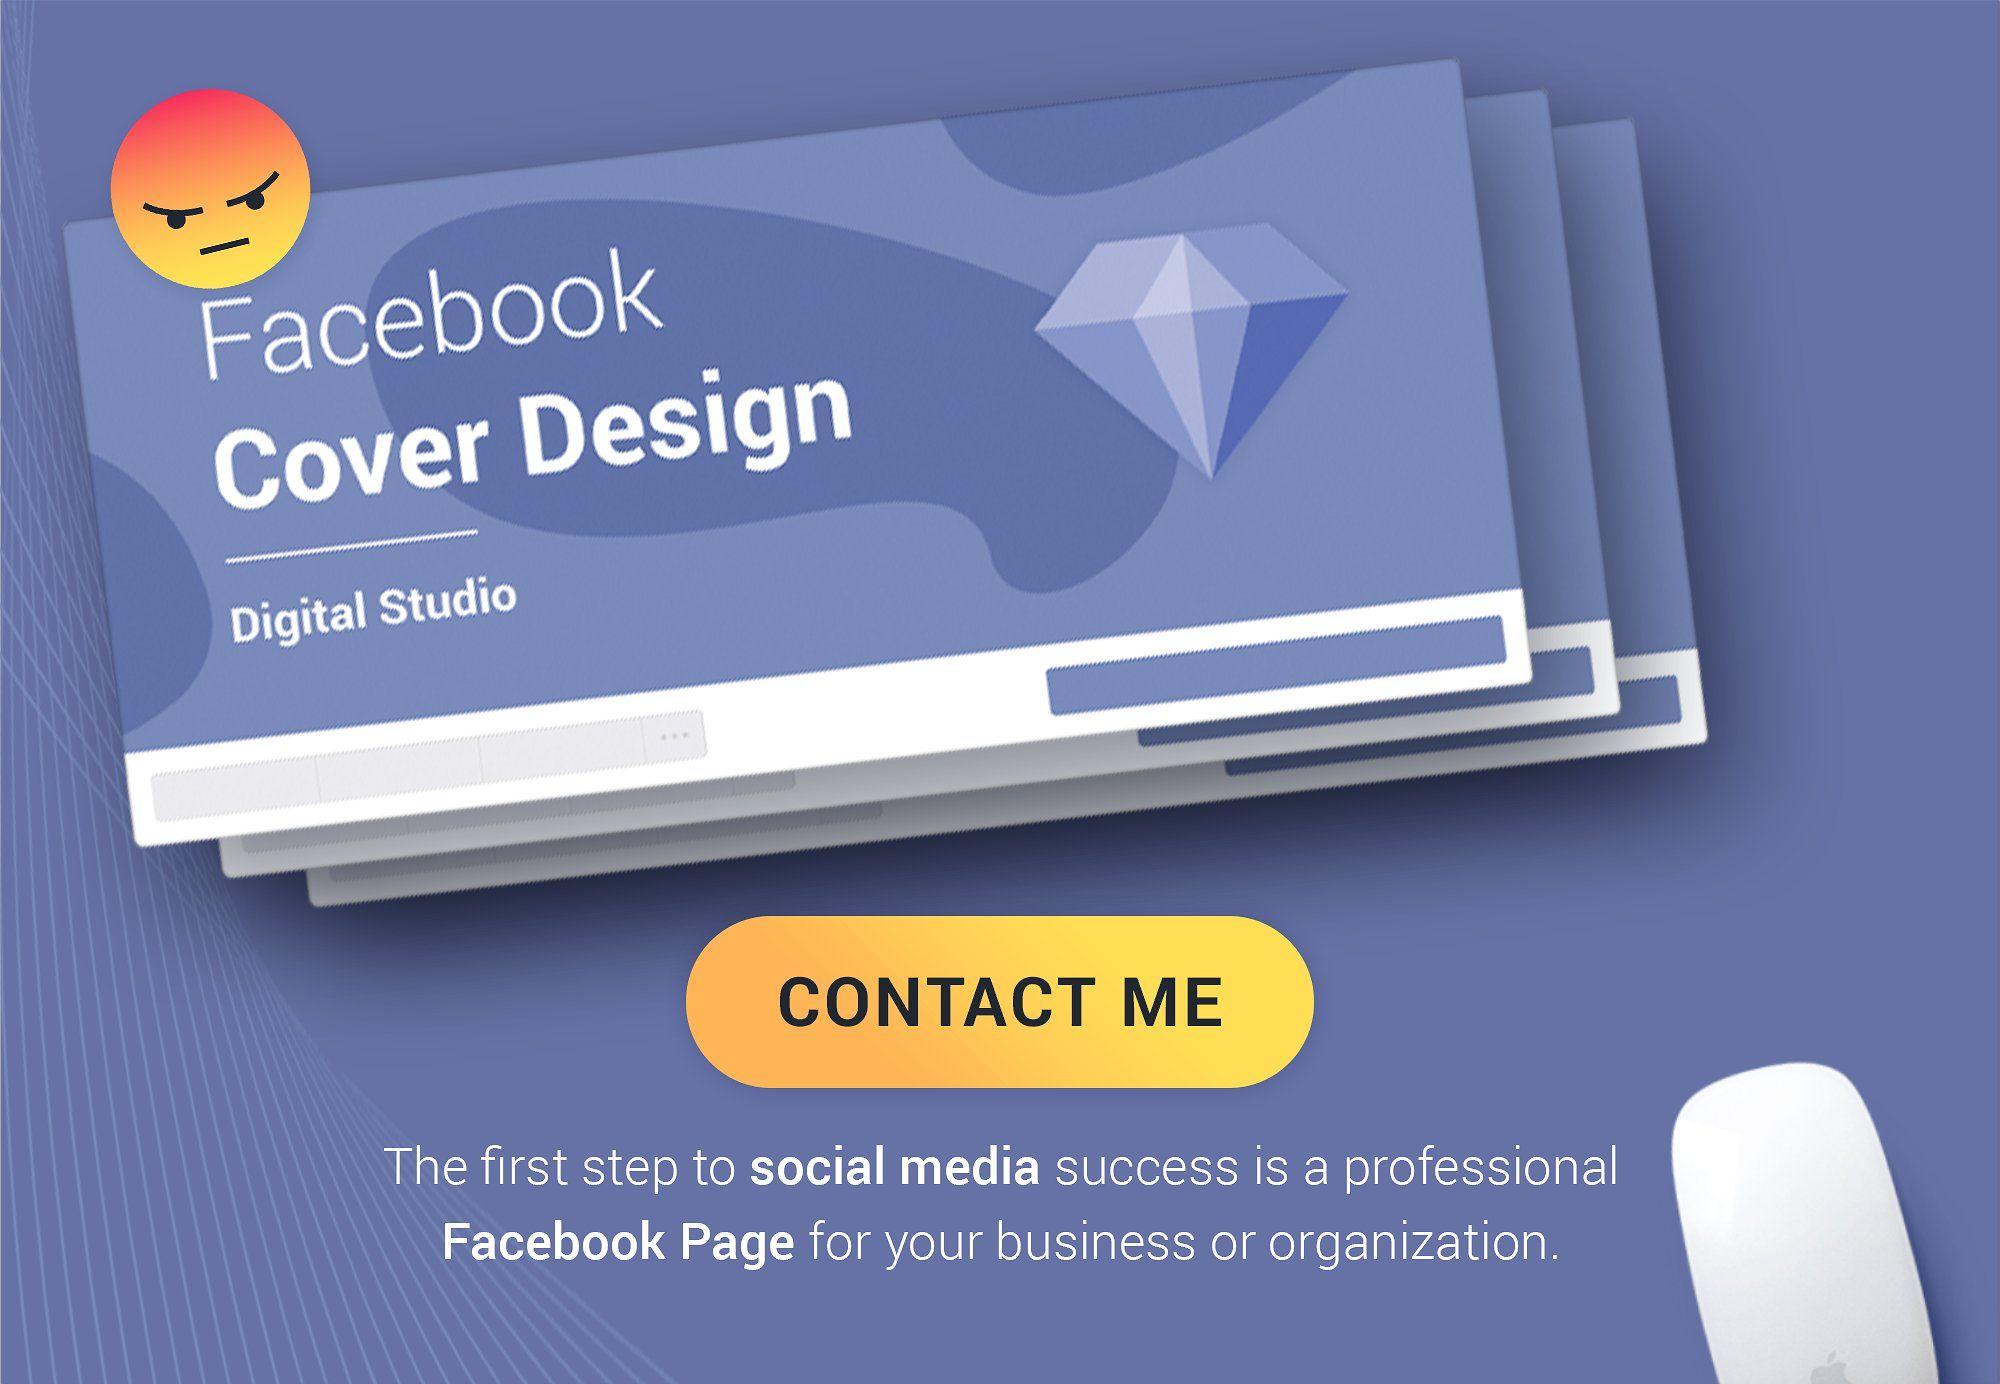 Facebook Templates Mockups Facebook Cover Design Social Media Success Social Media Pack